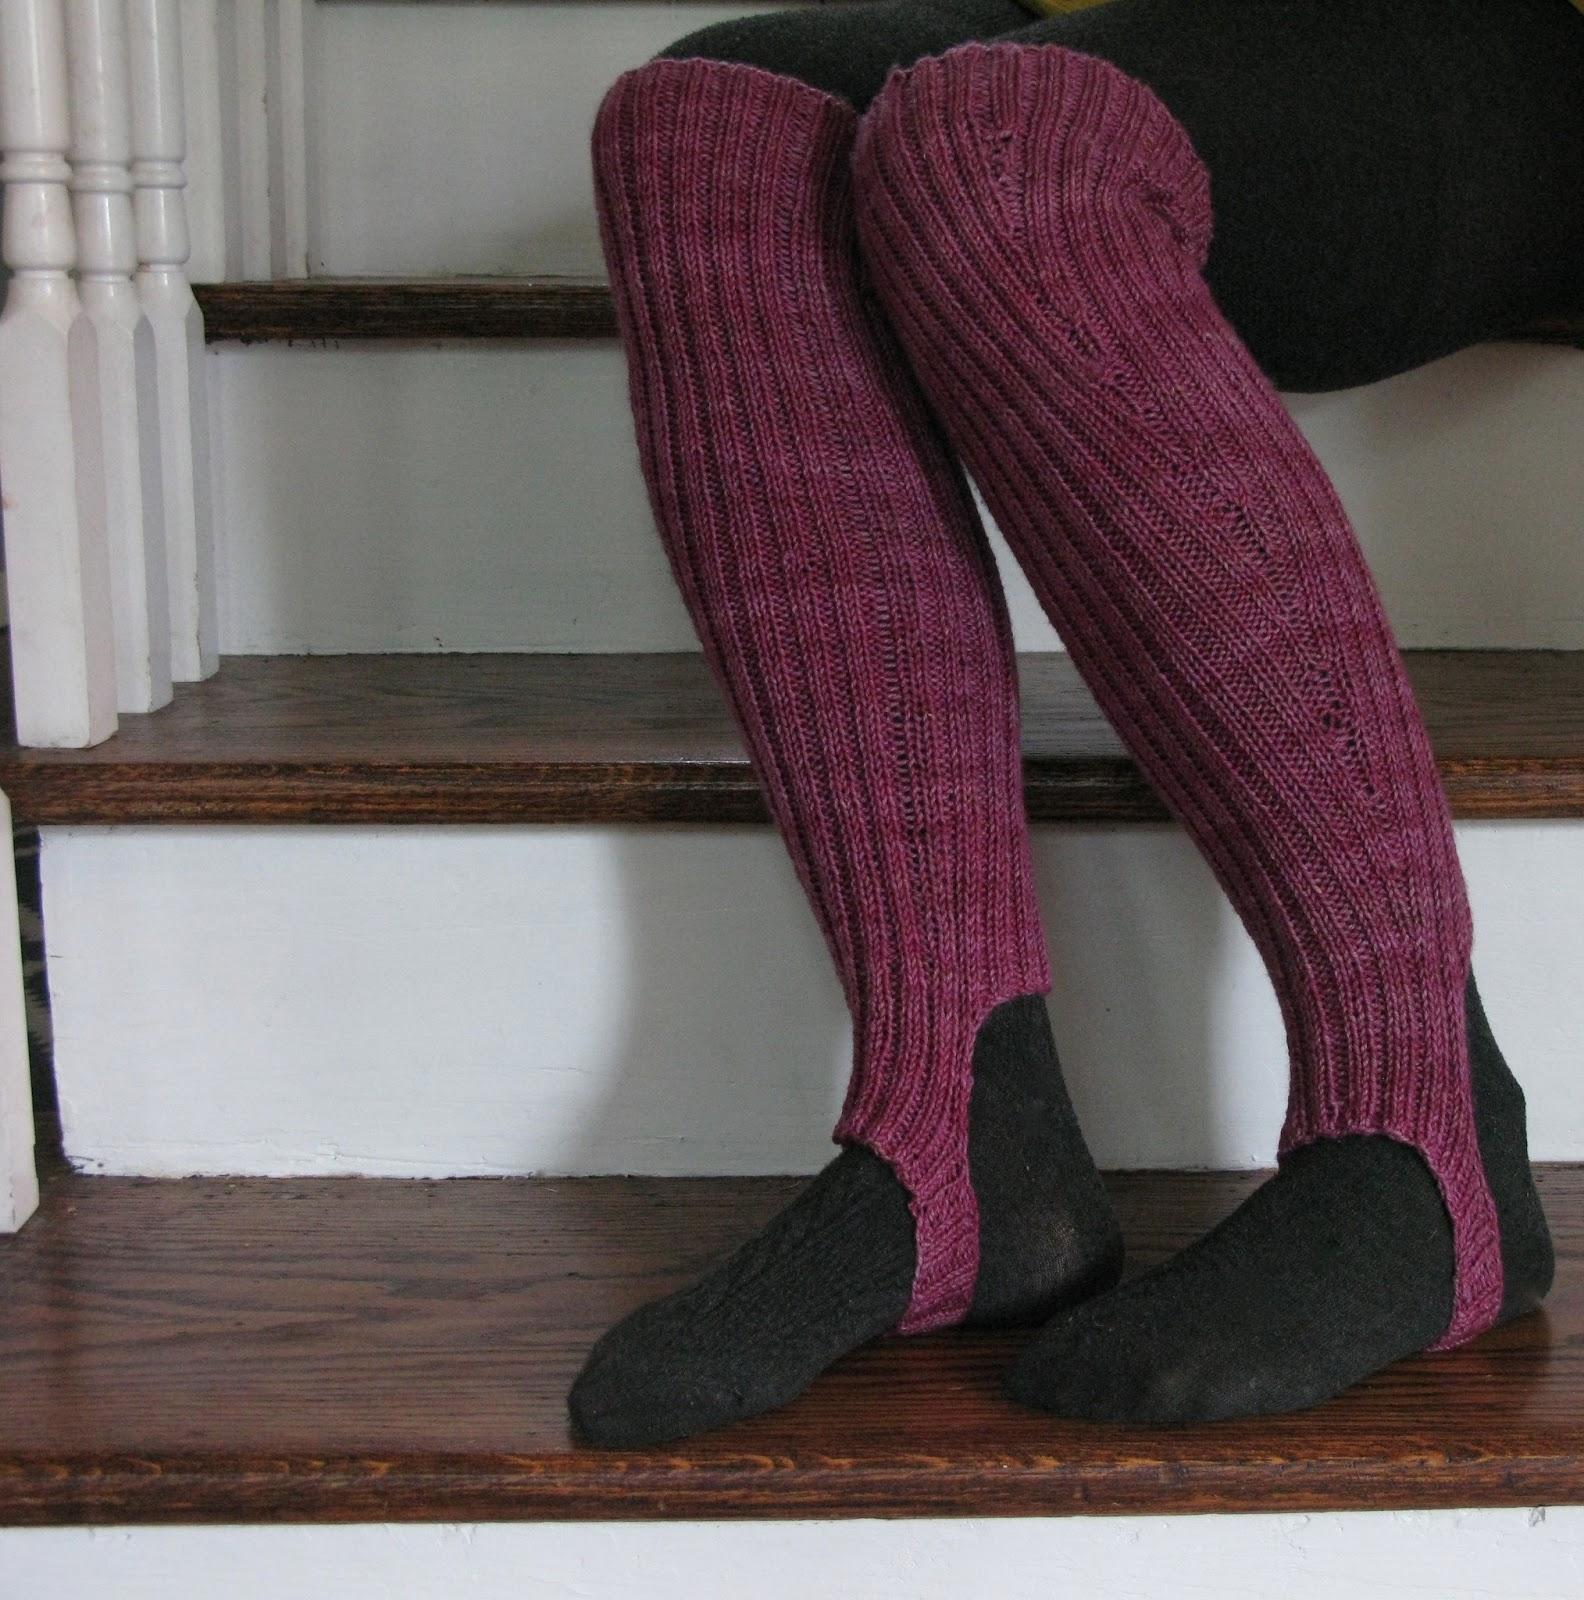 Sew Nancy: stirrup socks